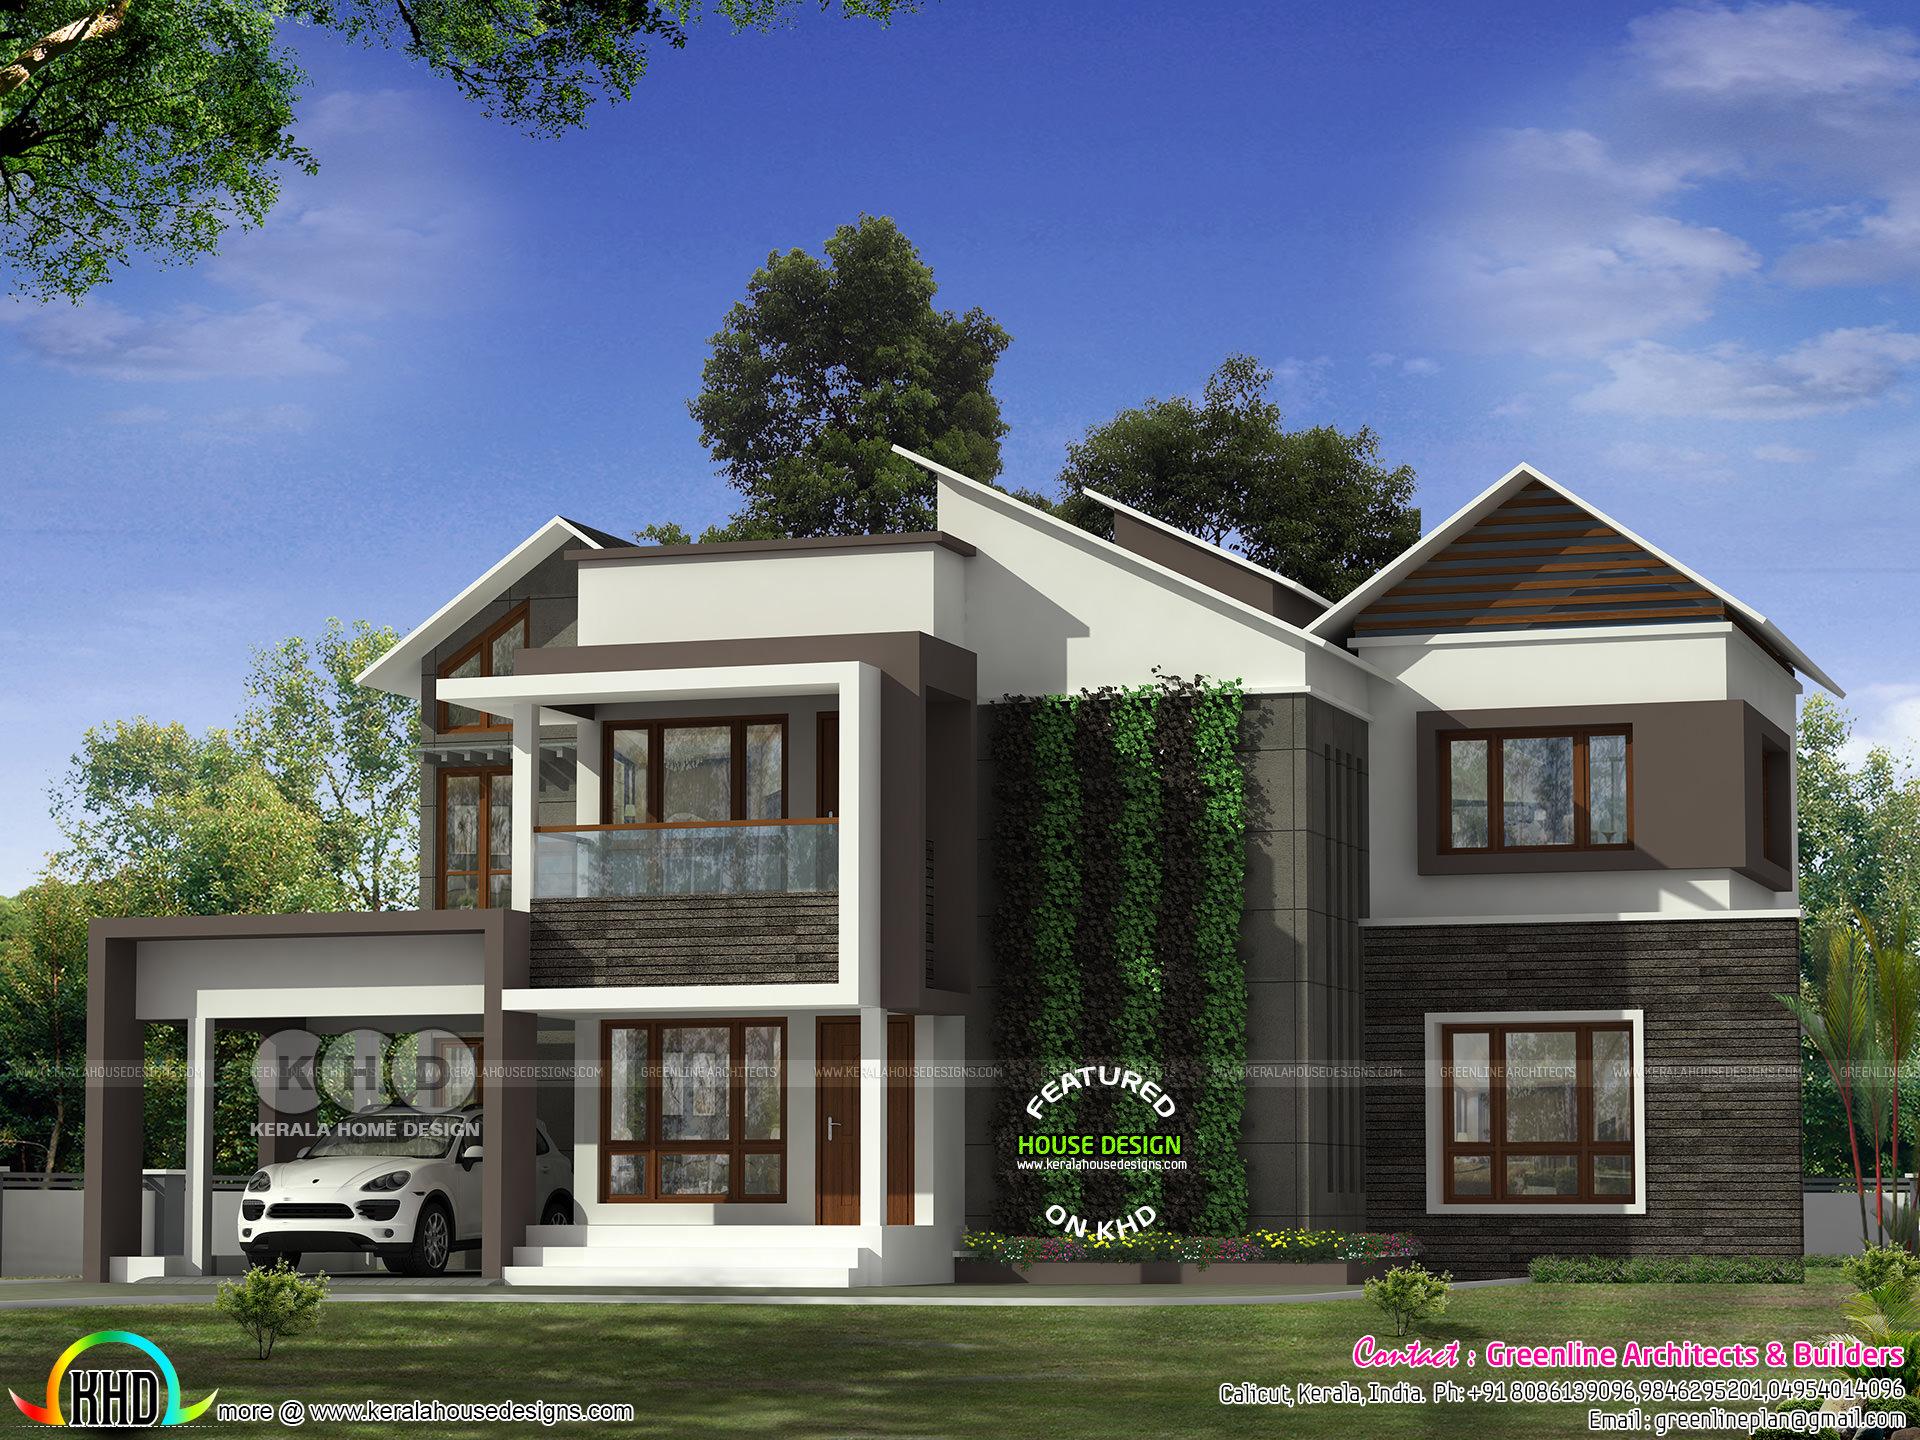 4 Bedroom Modern House With Vertical Garden Kerala Home